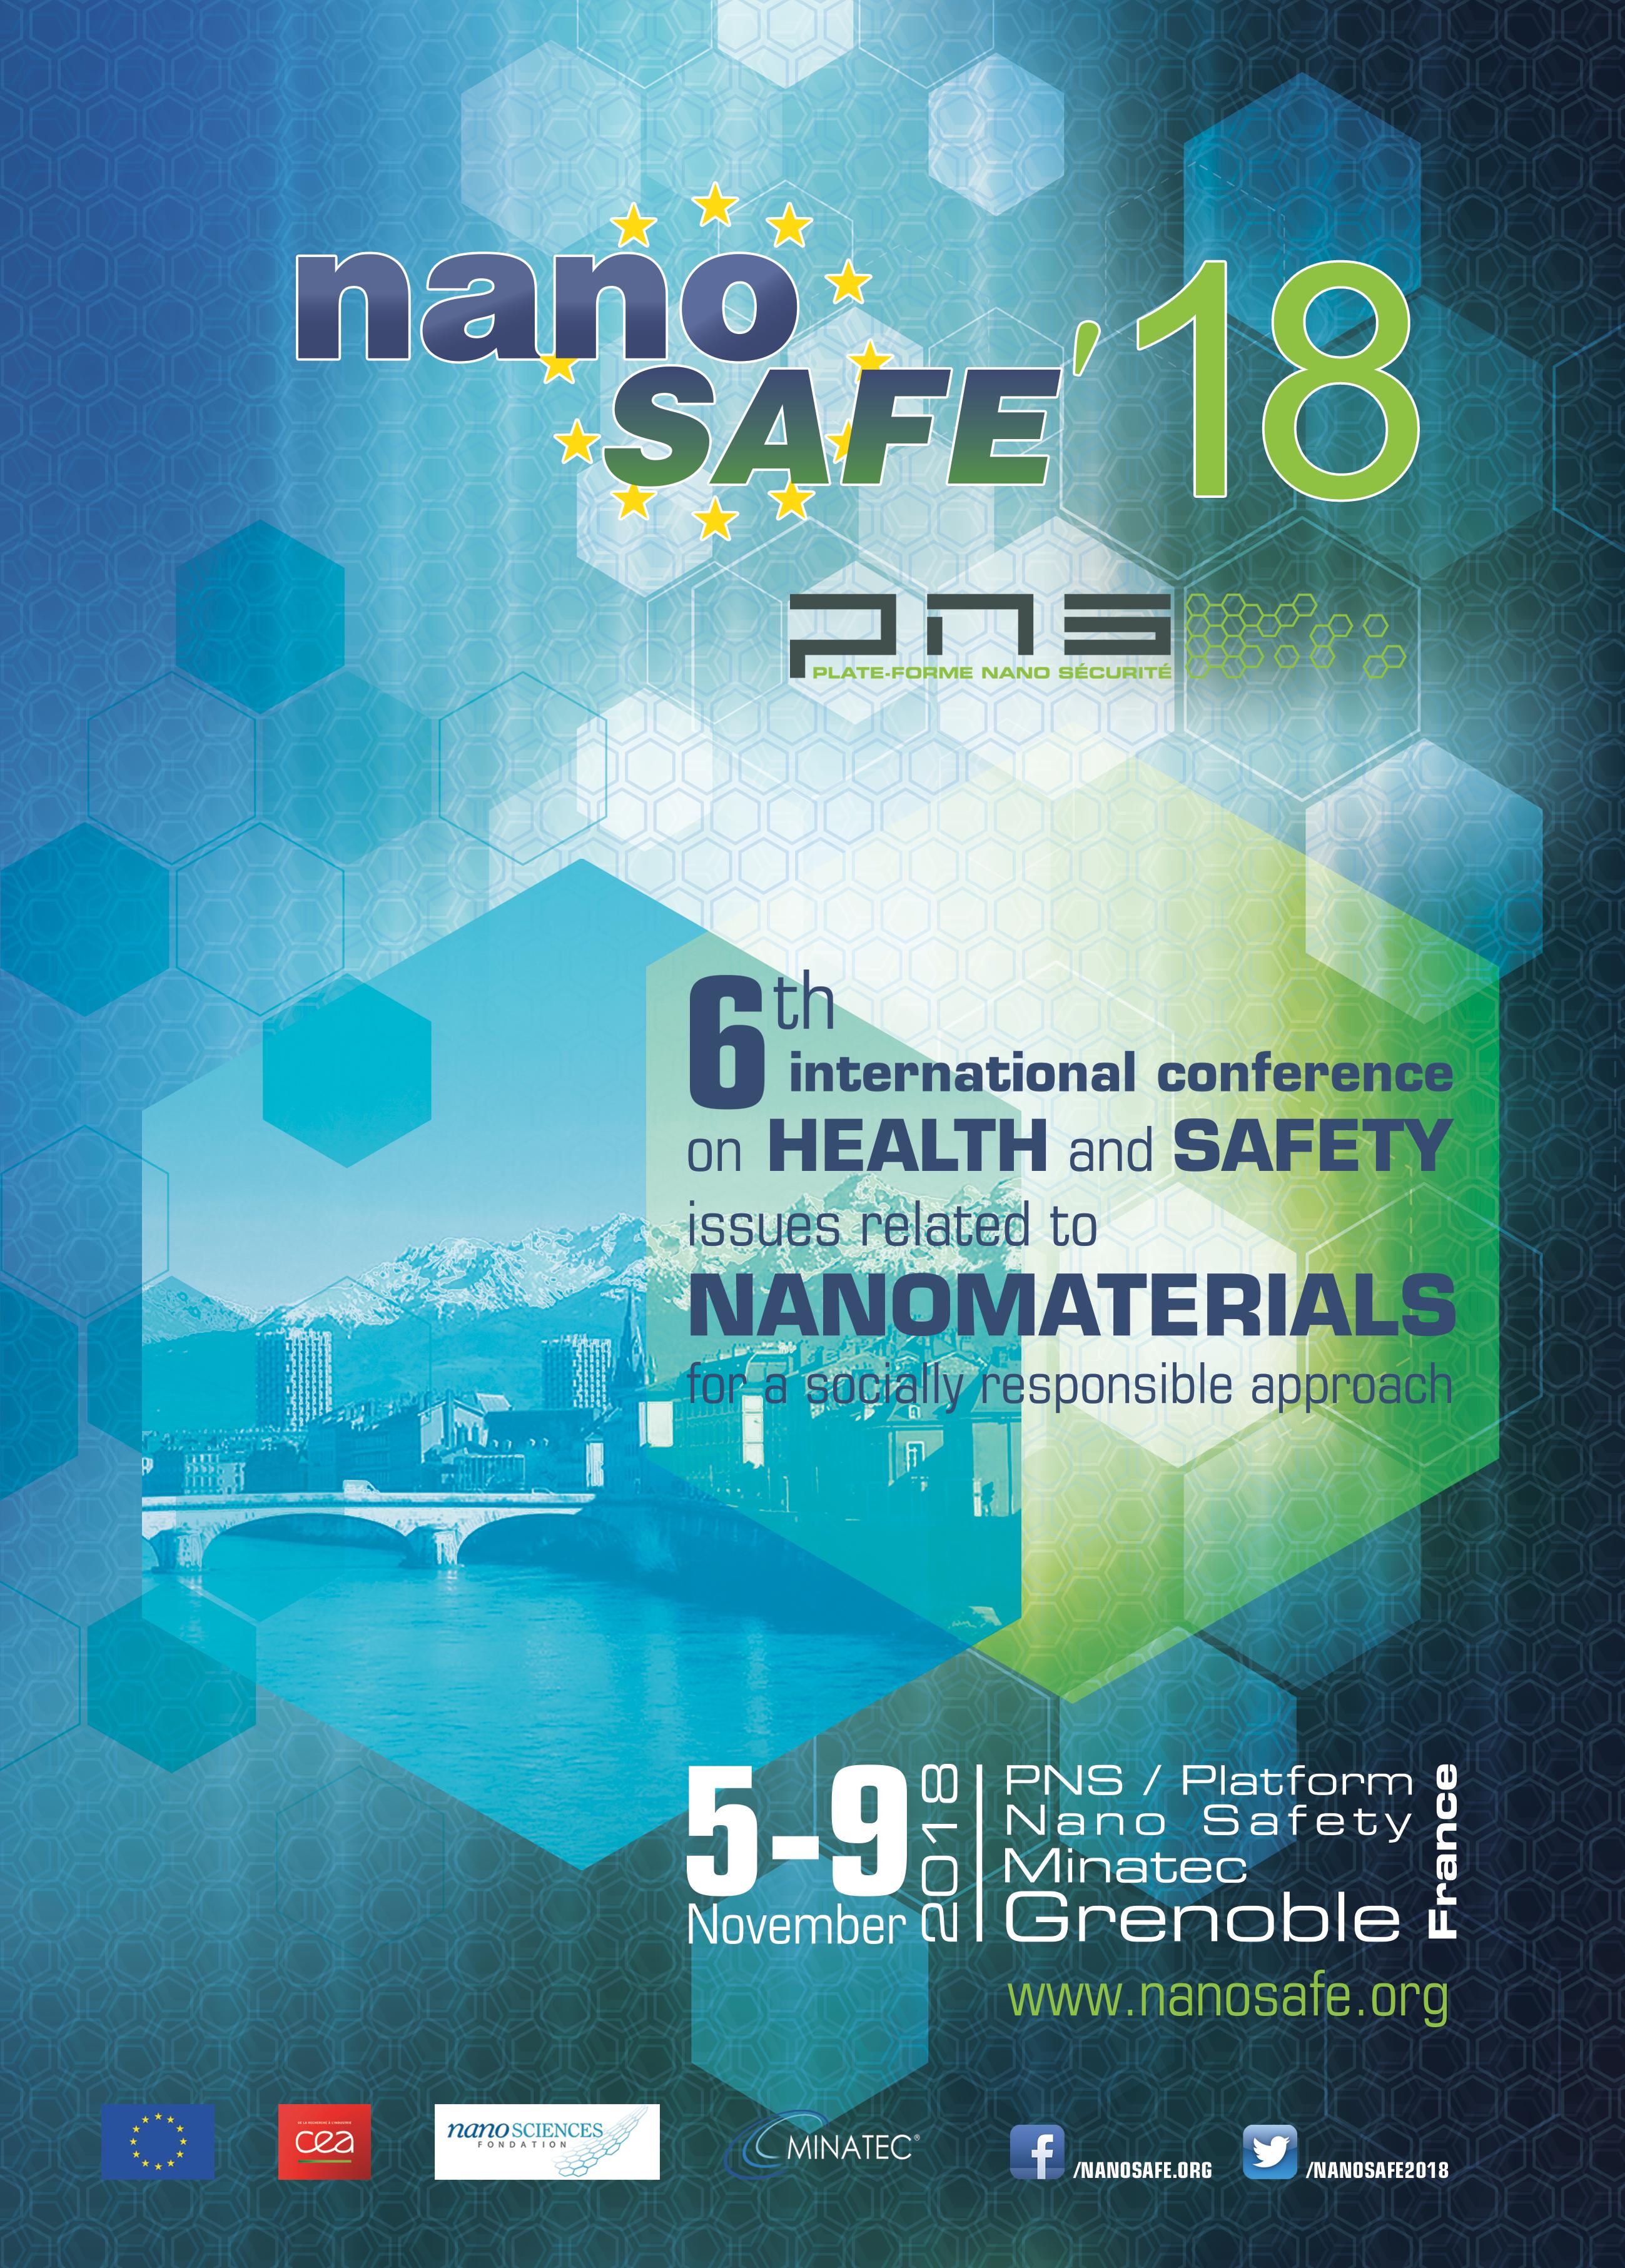 Nanosafe - General Overview